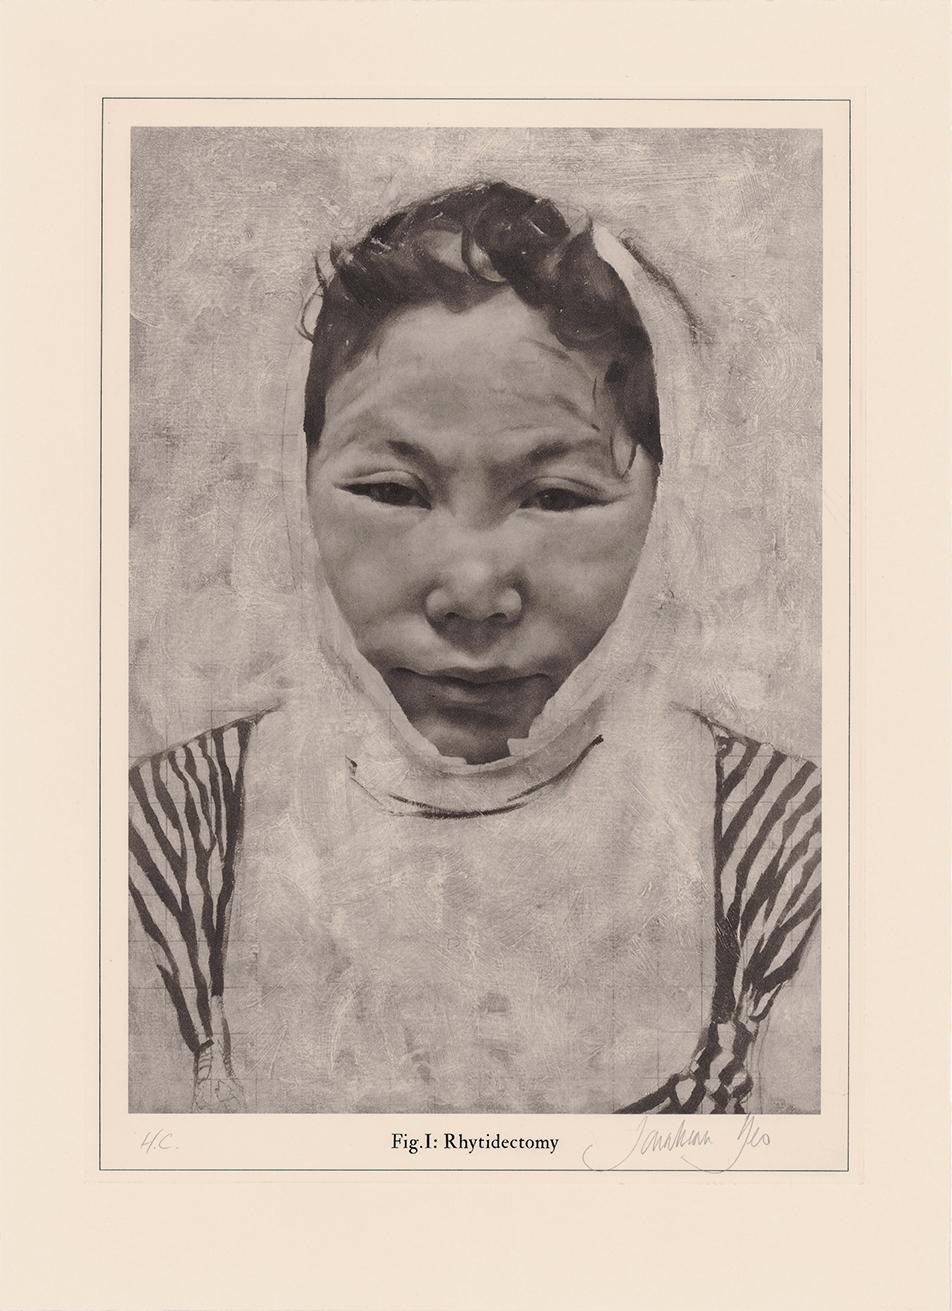 jonathan-yeo-rhytidectomy.jpg